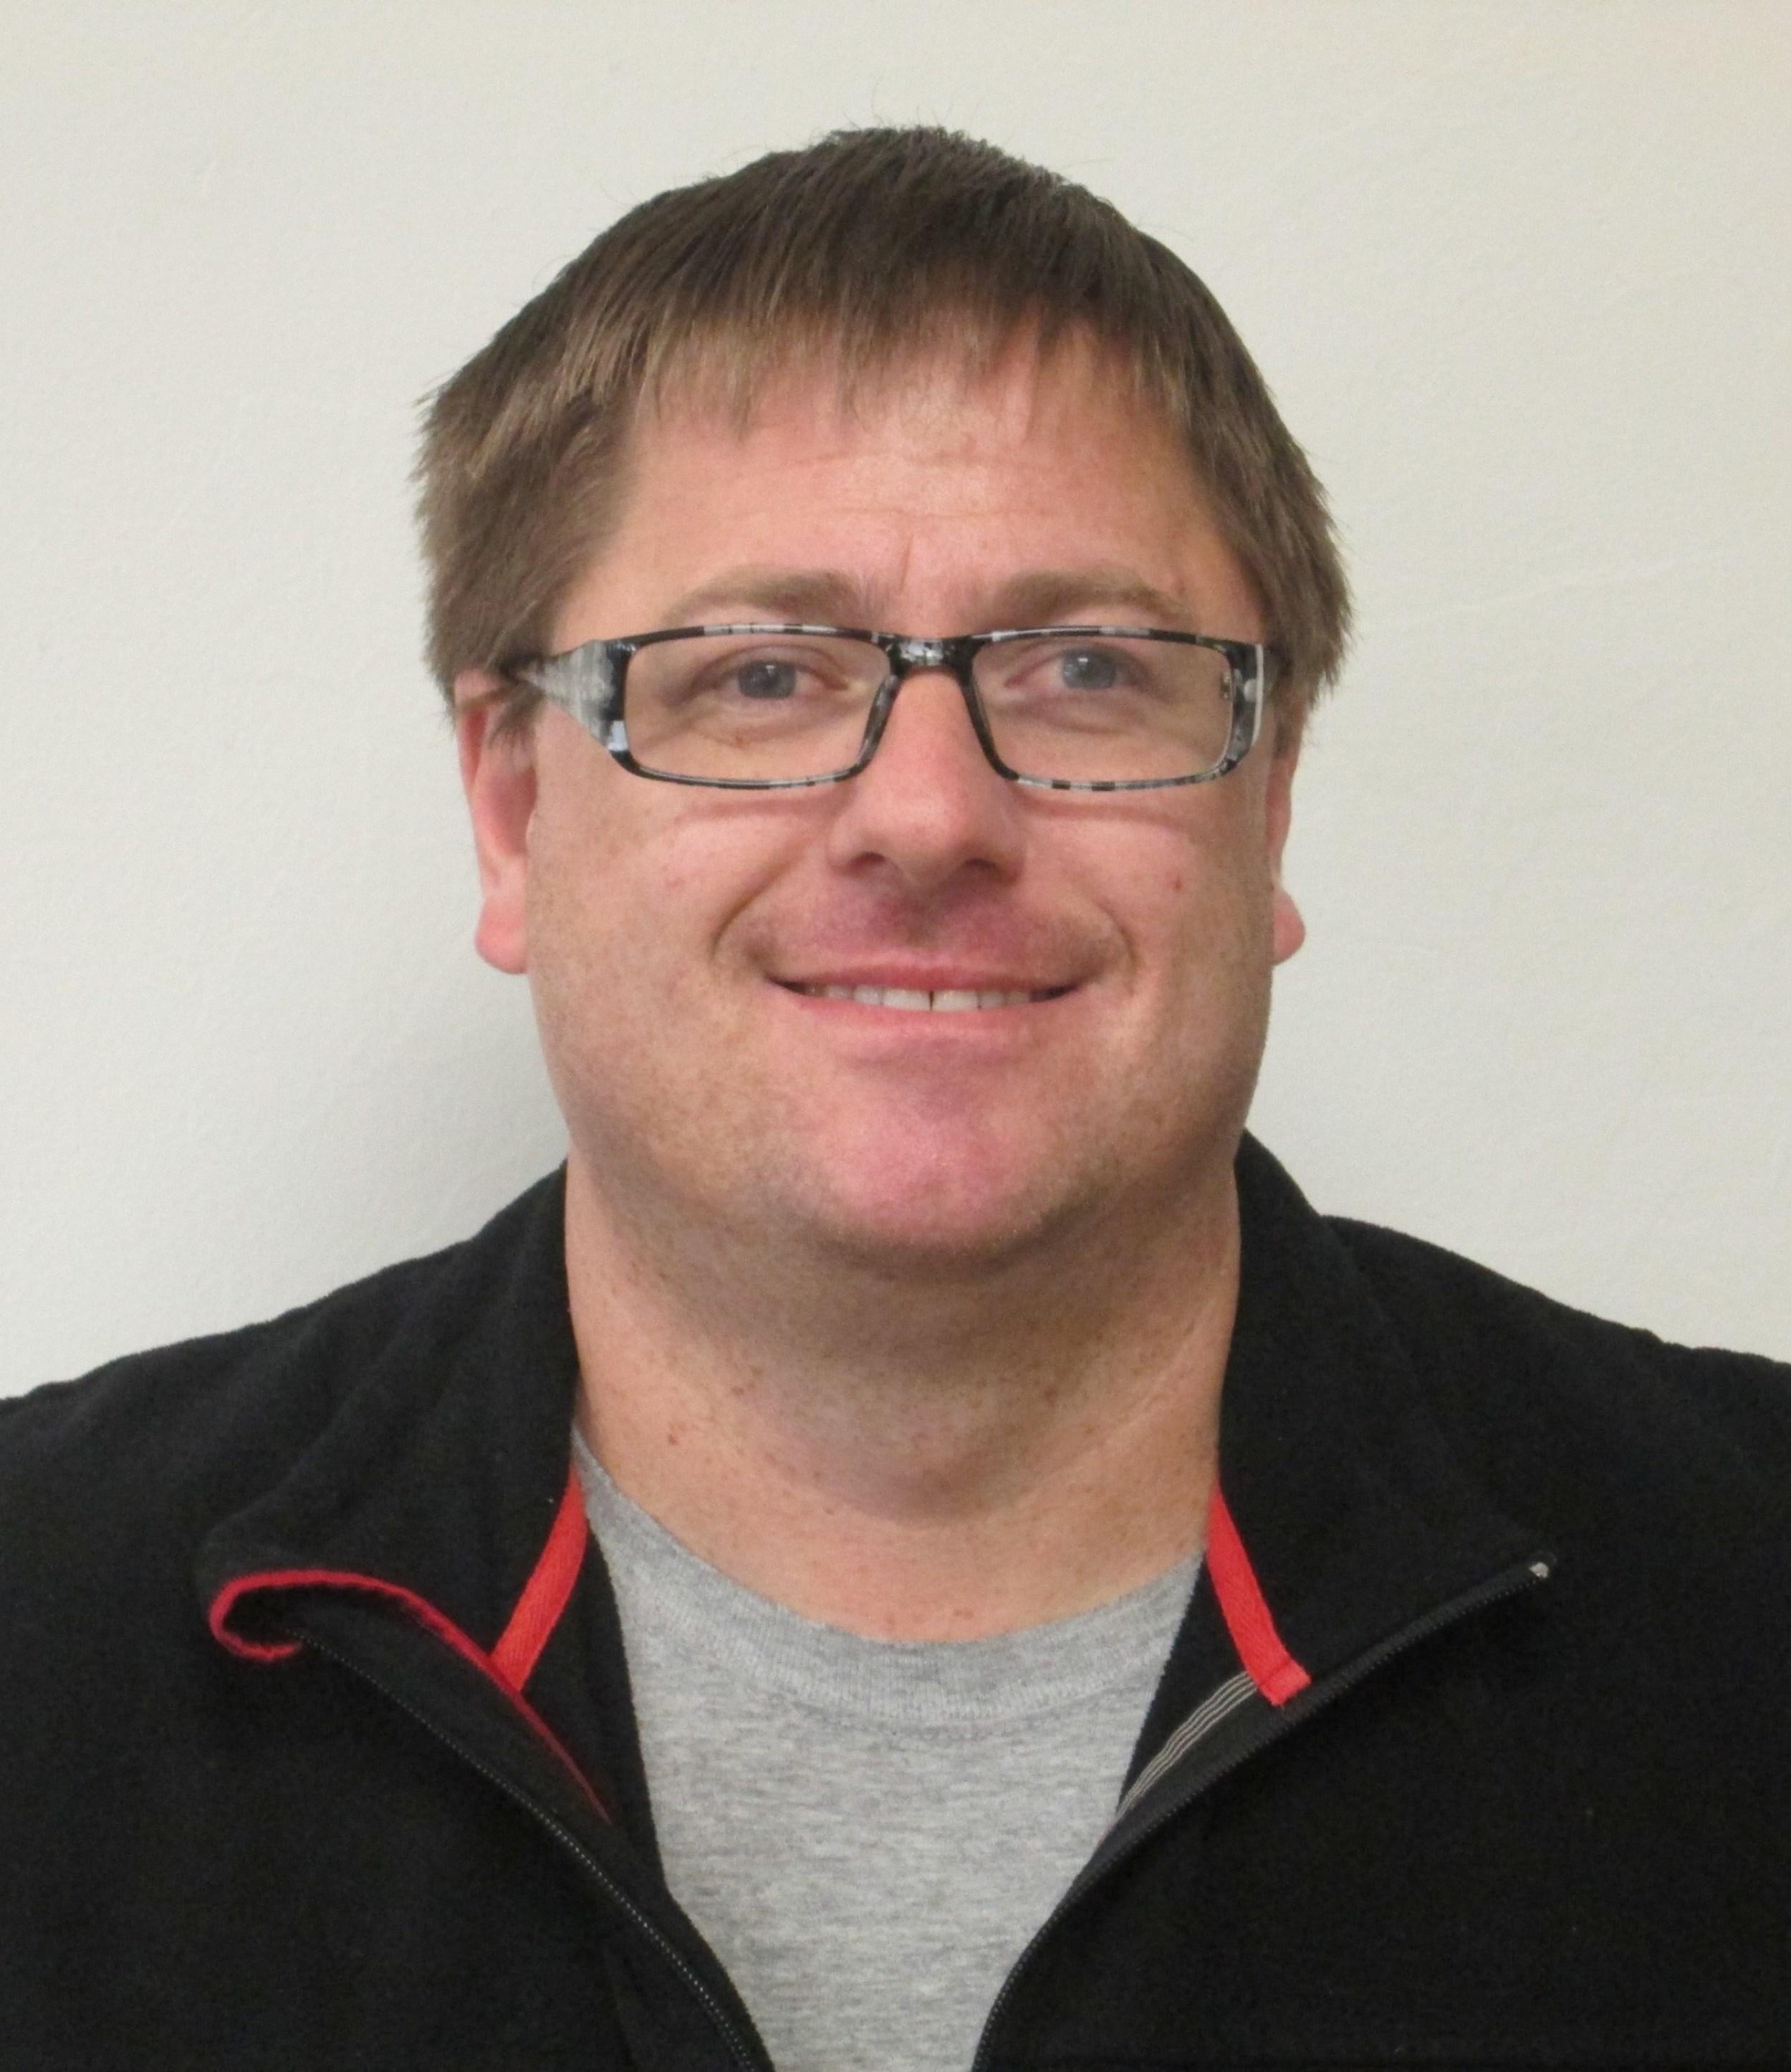 Chris Blan, Resource Recovery Technician